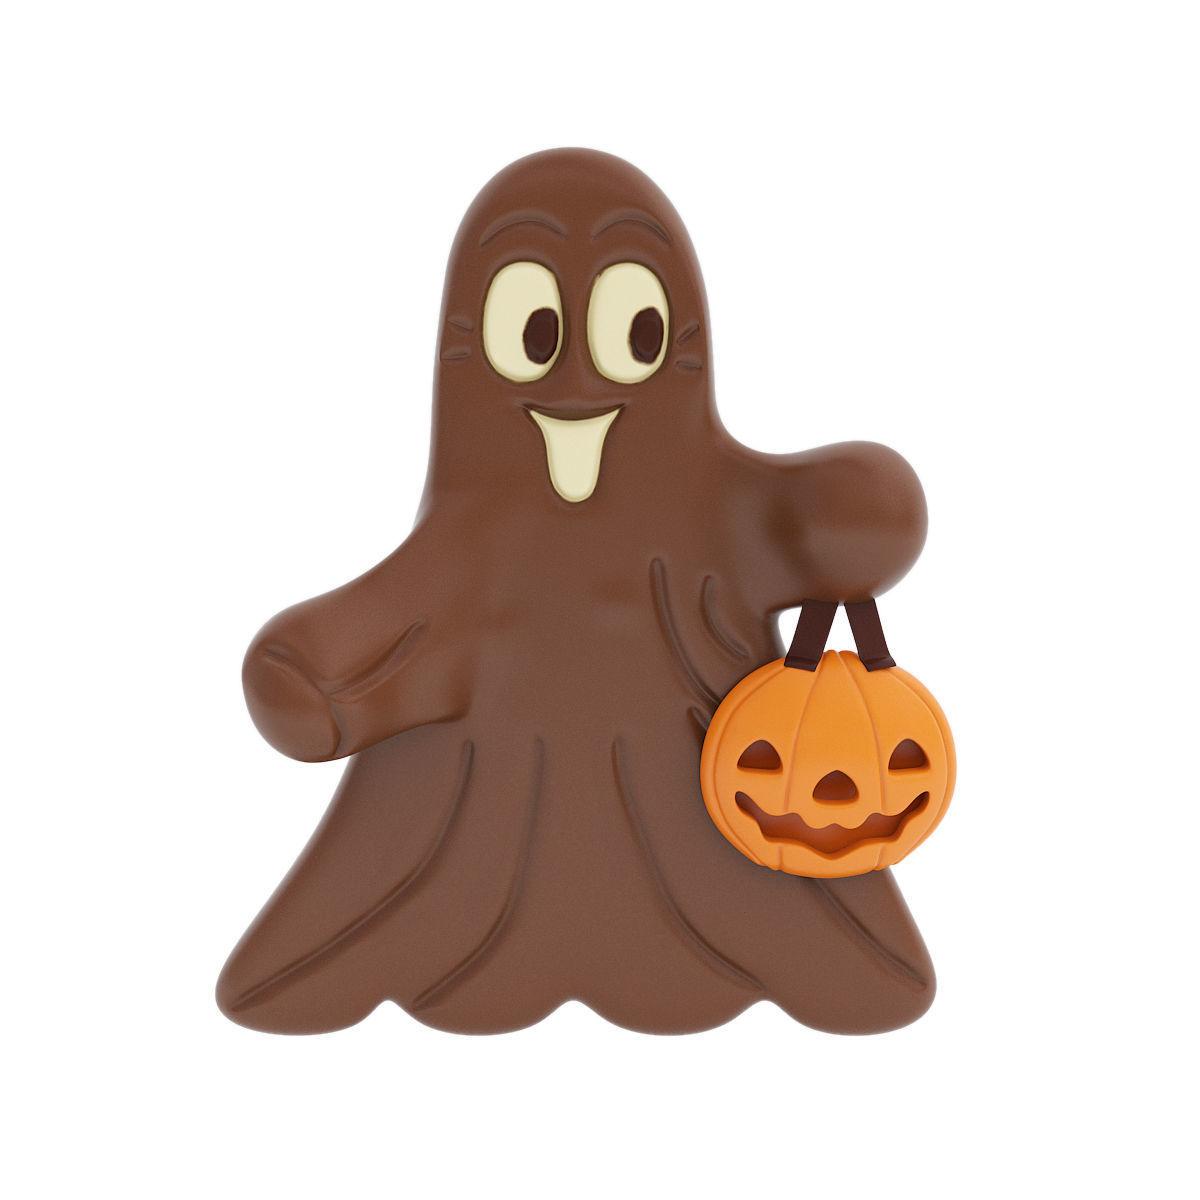 Chocolate ghost figurine